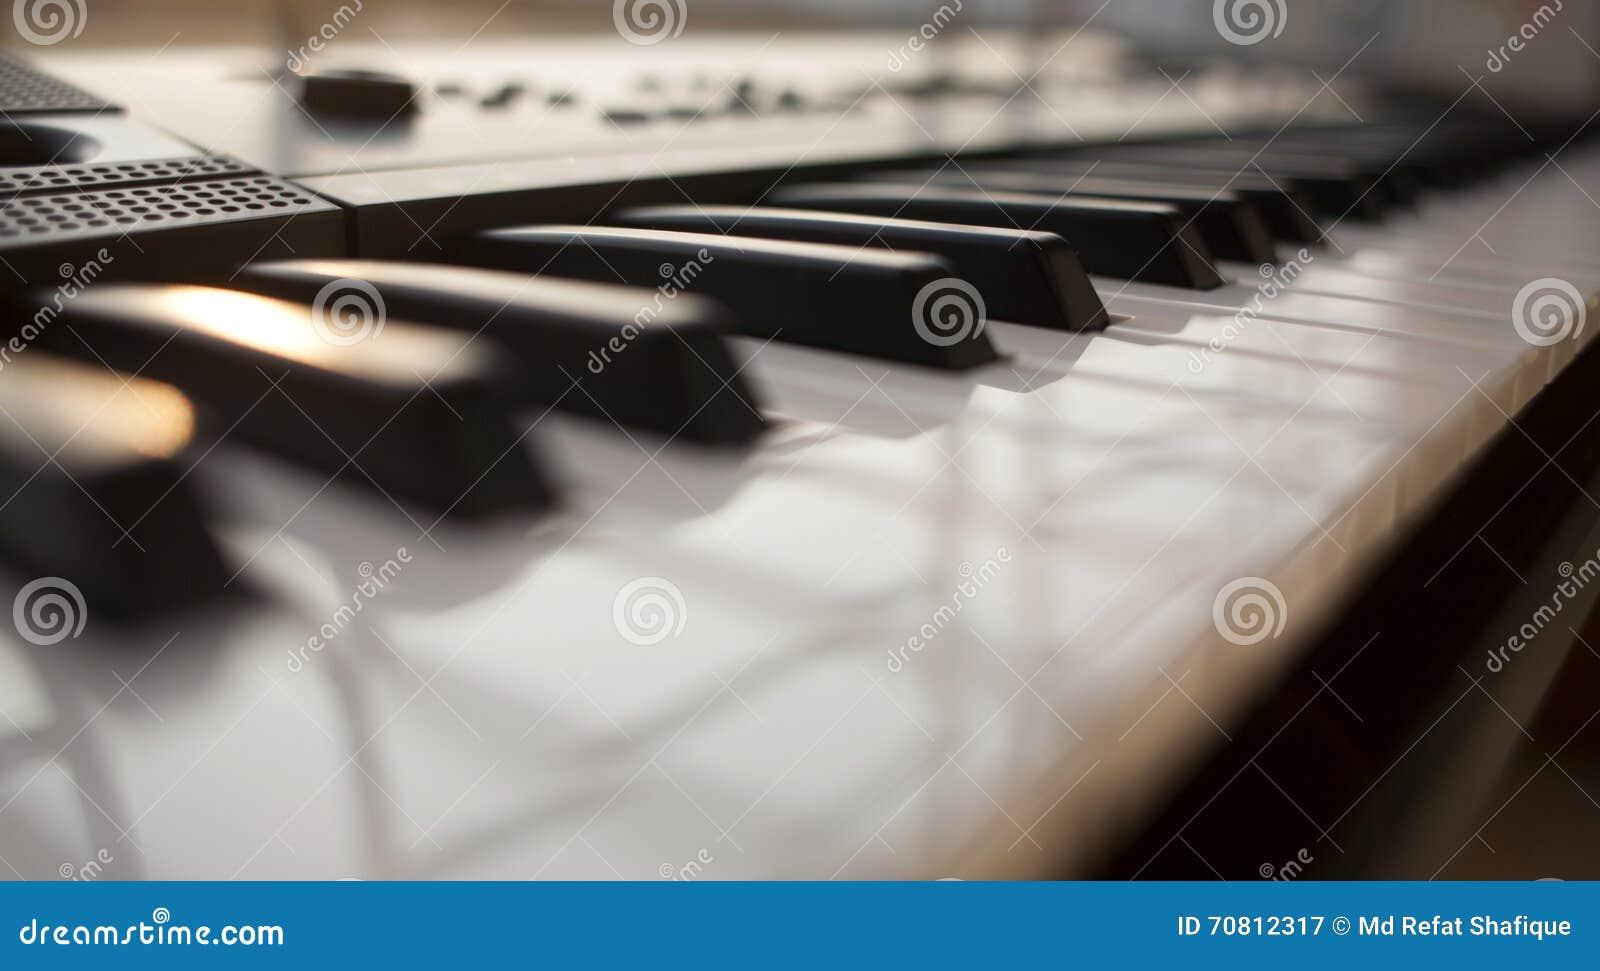 Black ivory keys piano white